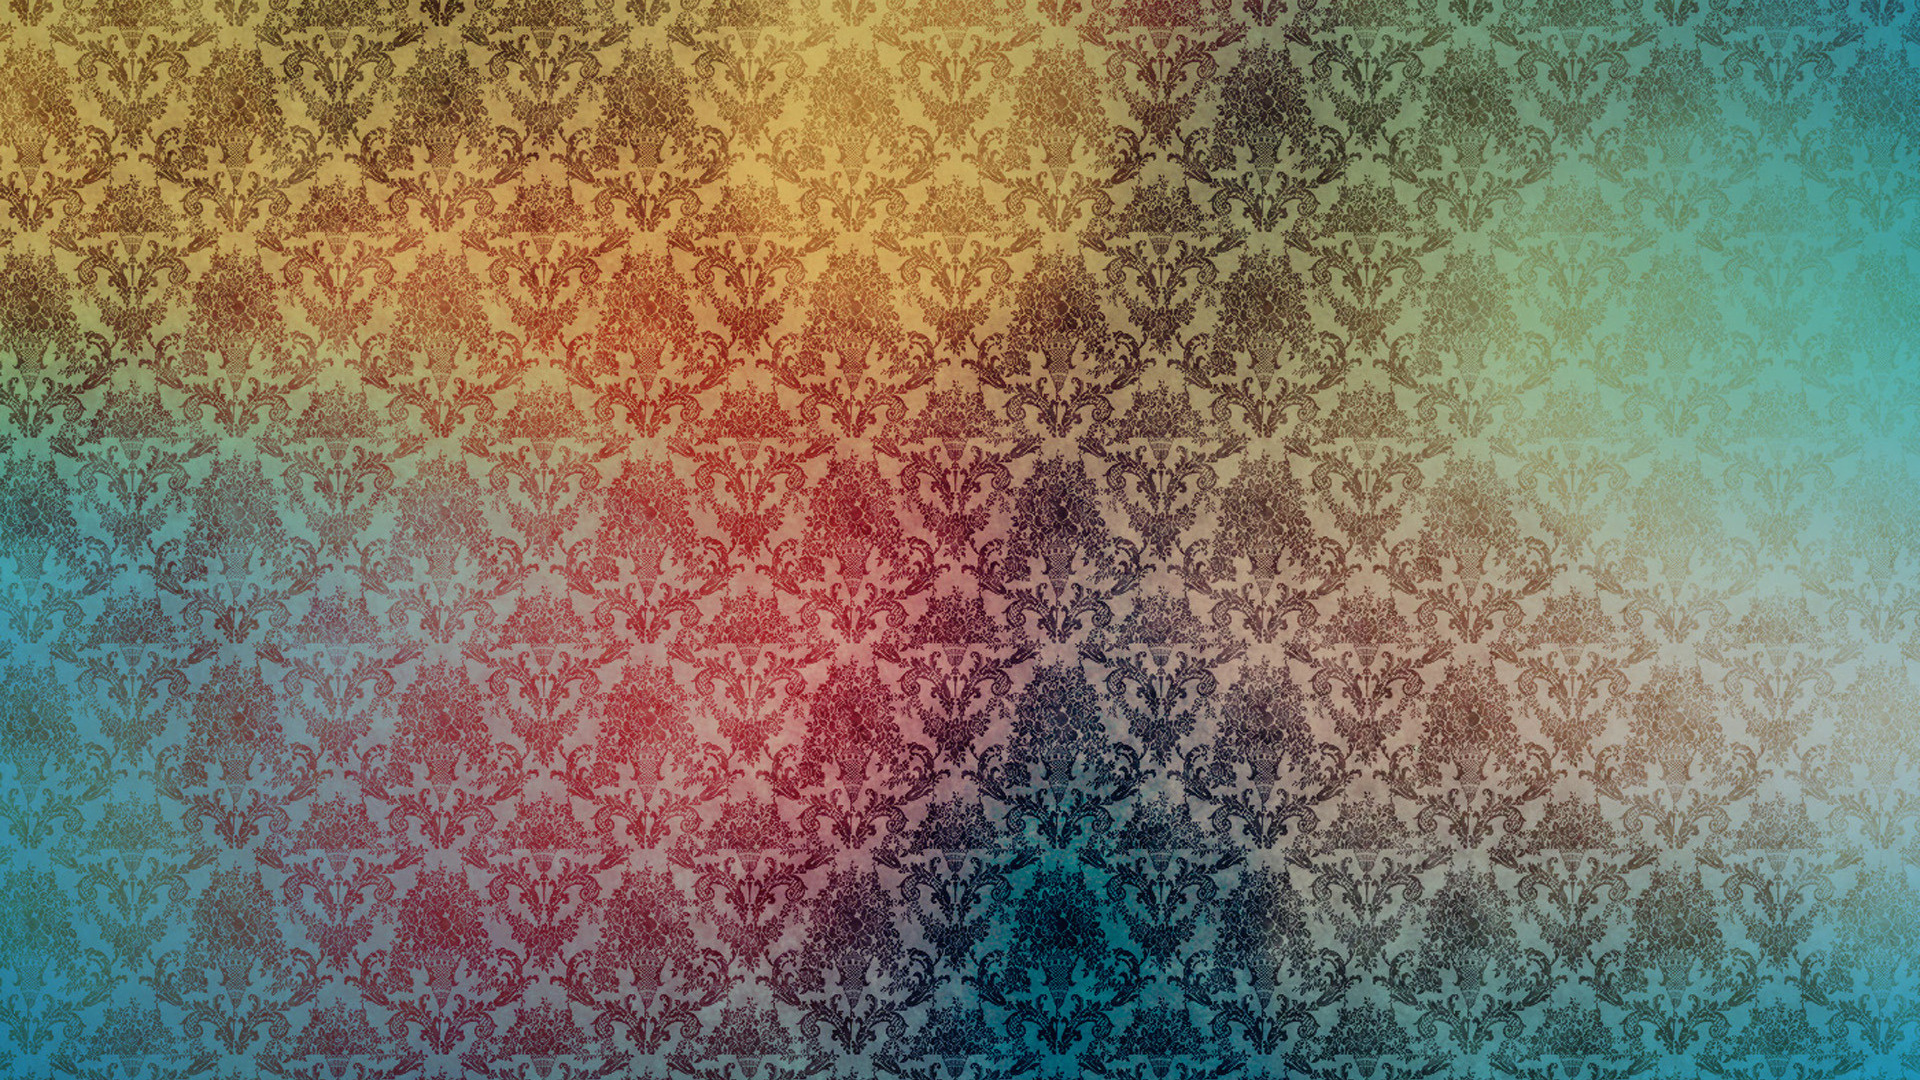 50 HD Retro Wallpapers 1920x1080